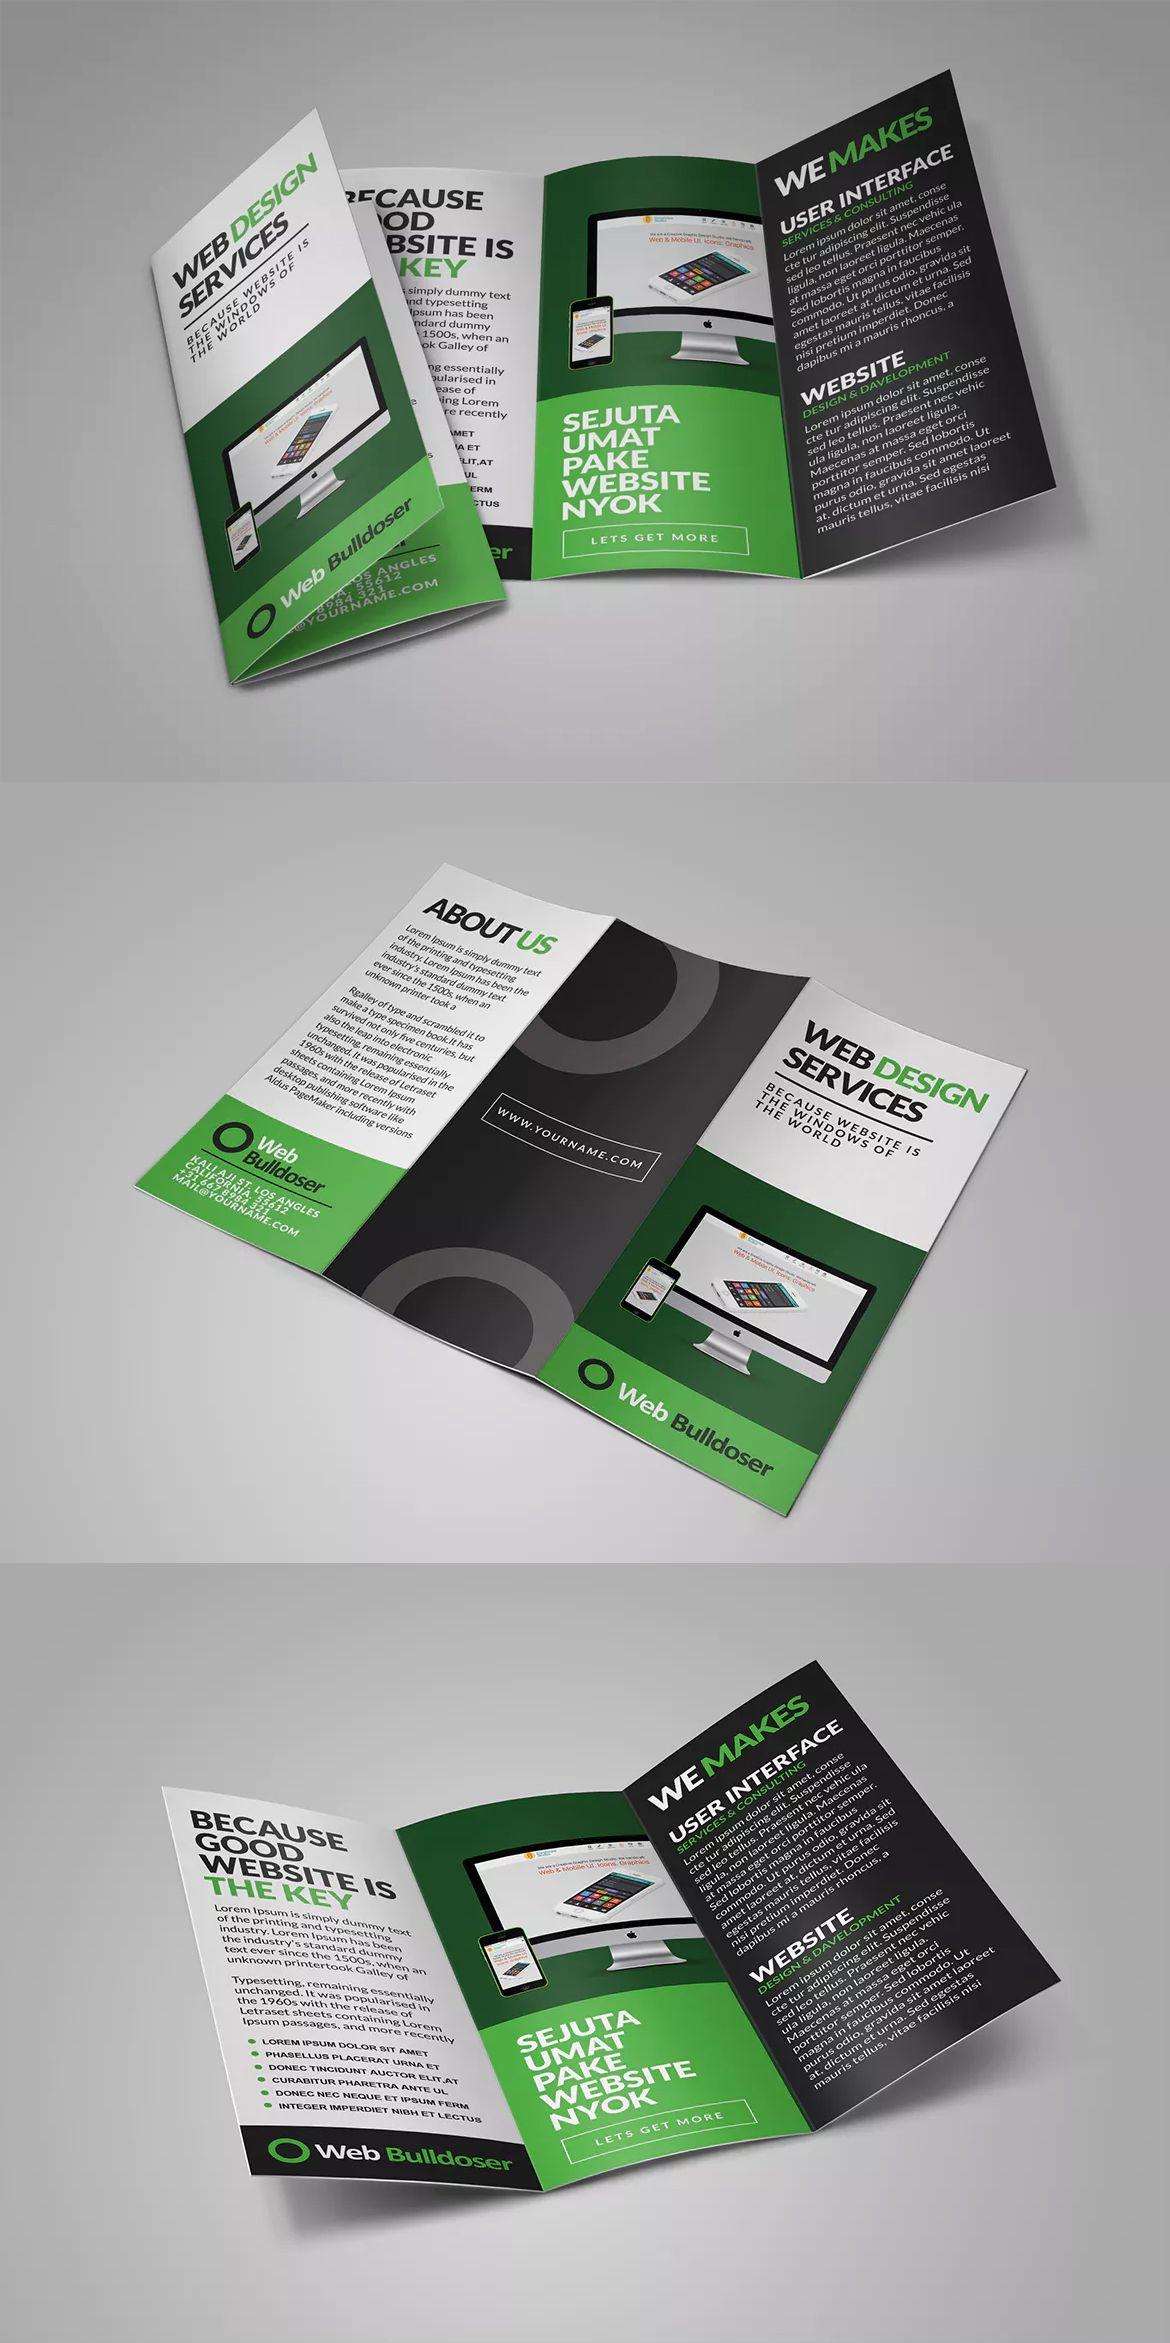 Web Design Trifold Brochure Templates PSD